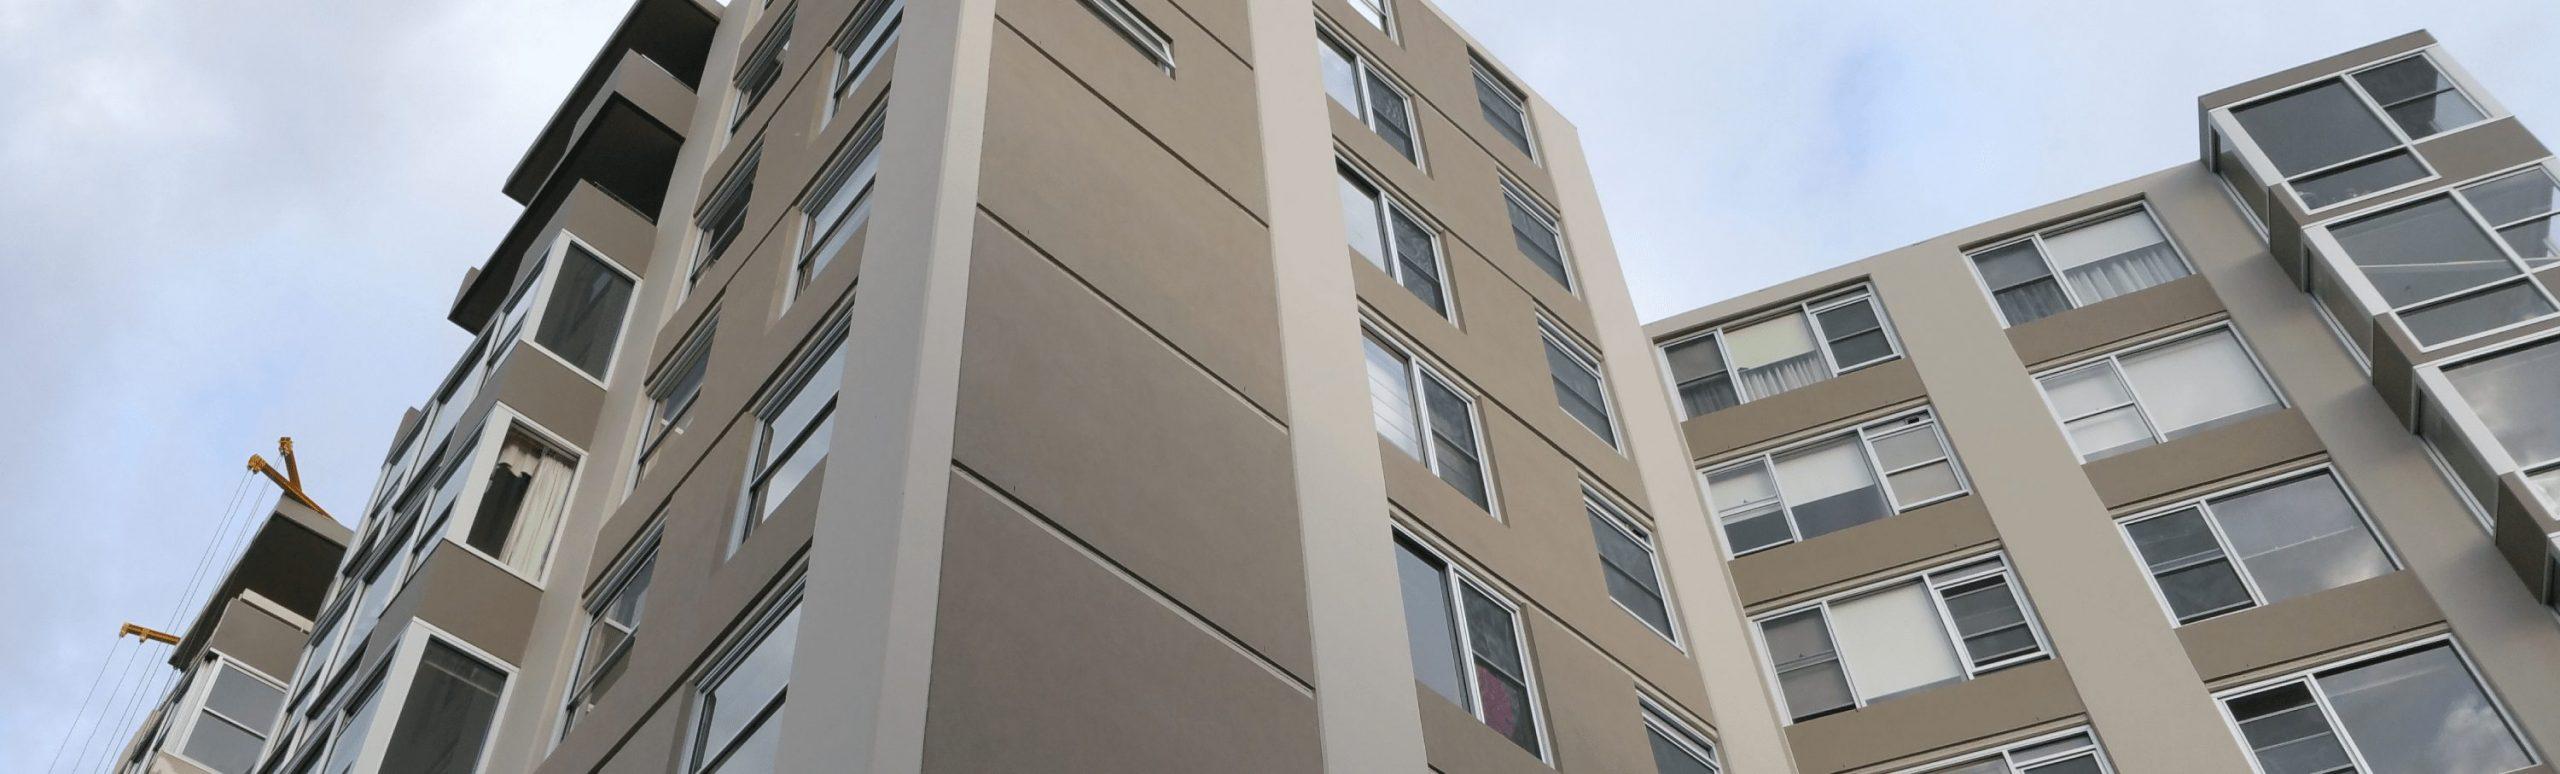 Remedial Works | Sydney | MJ Engineering